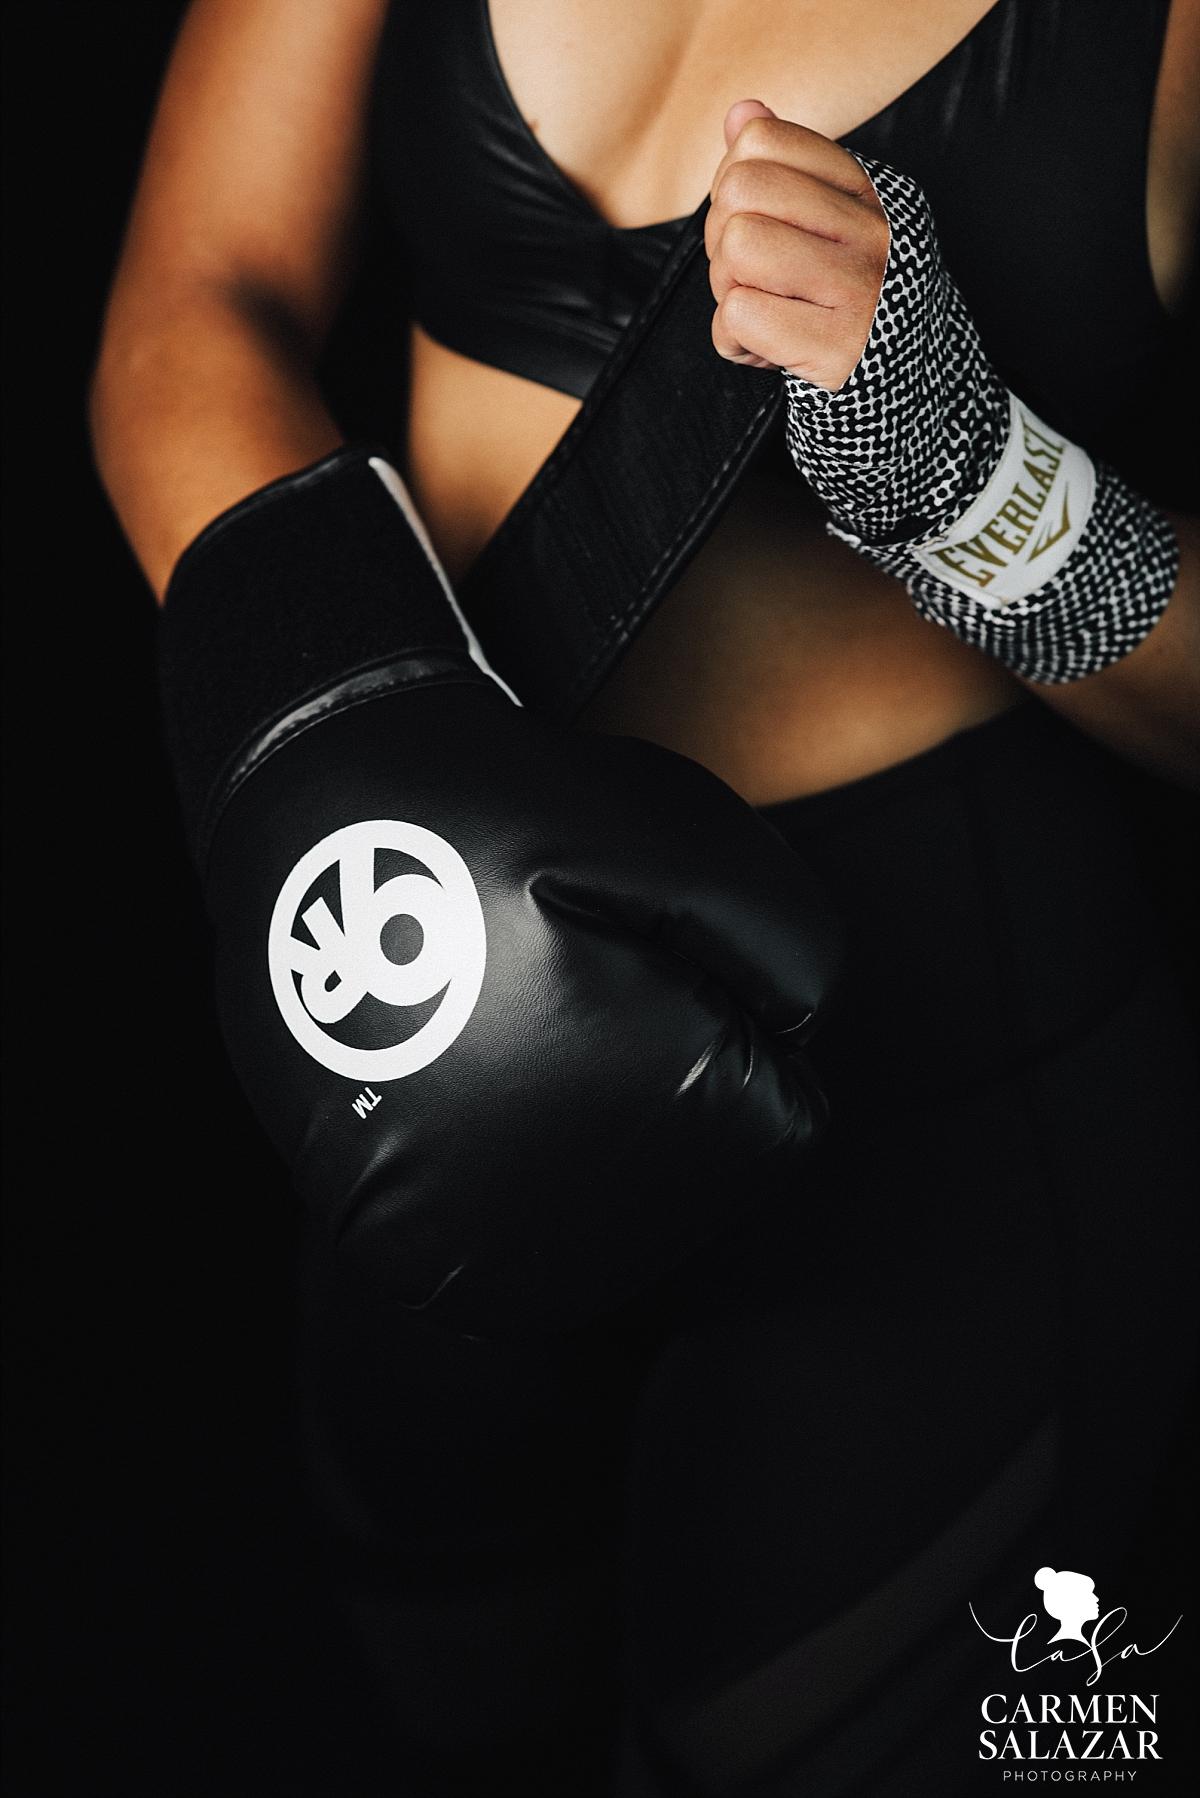 Fitness portrait gear detail - Carmen Salazar